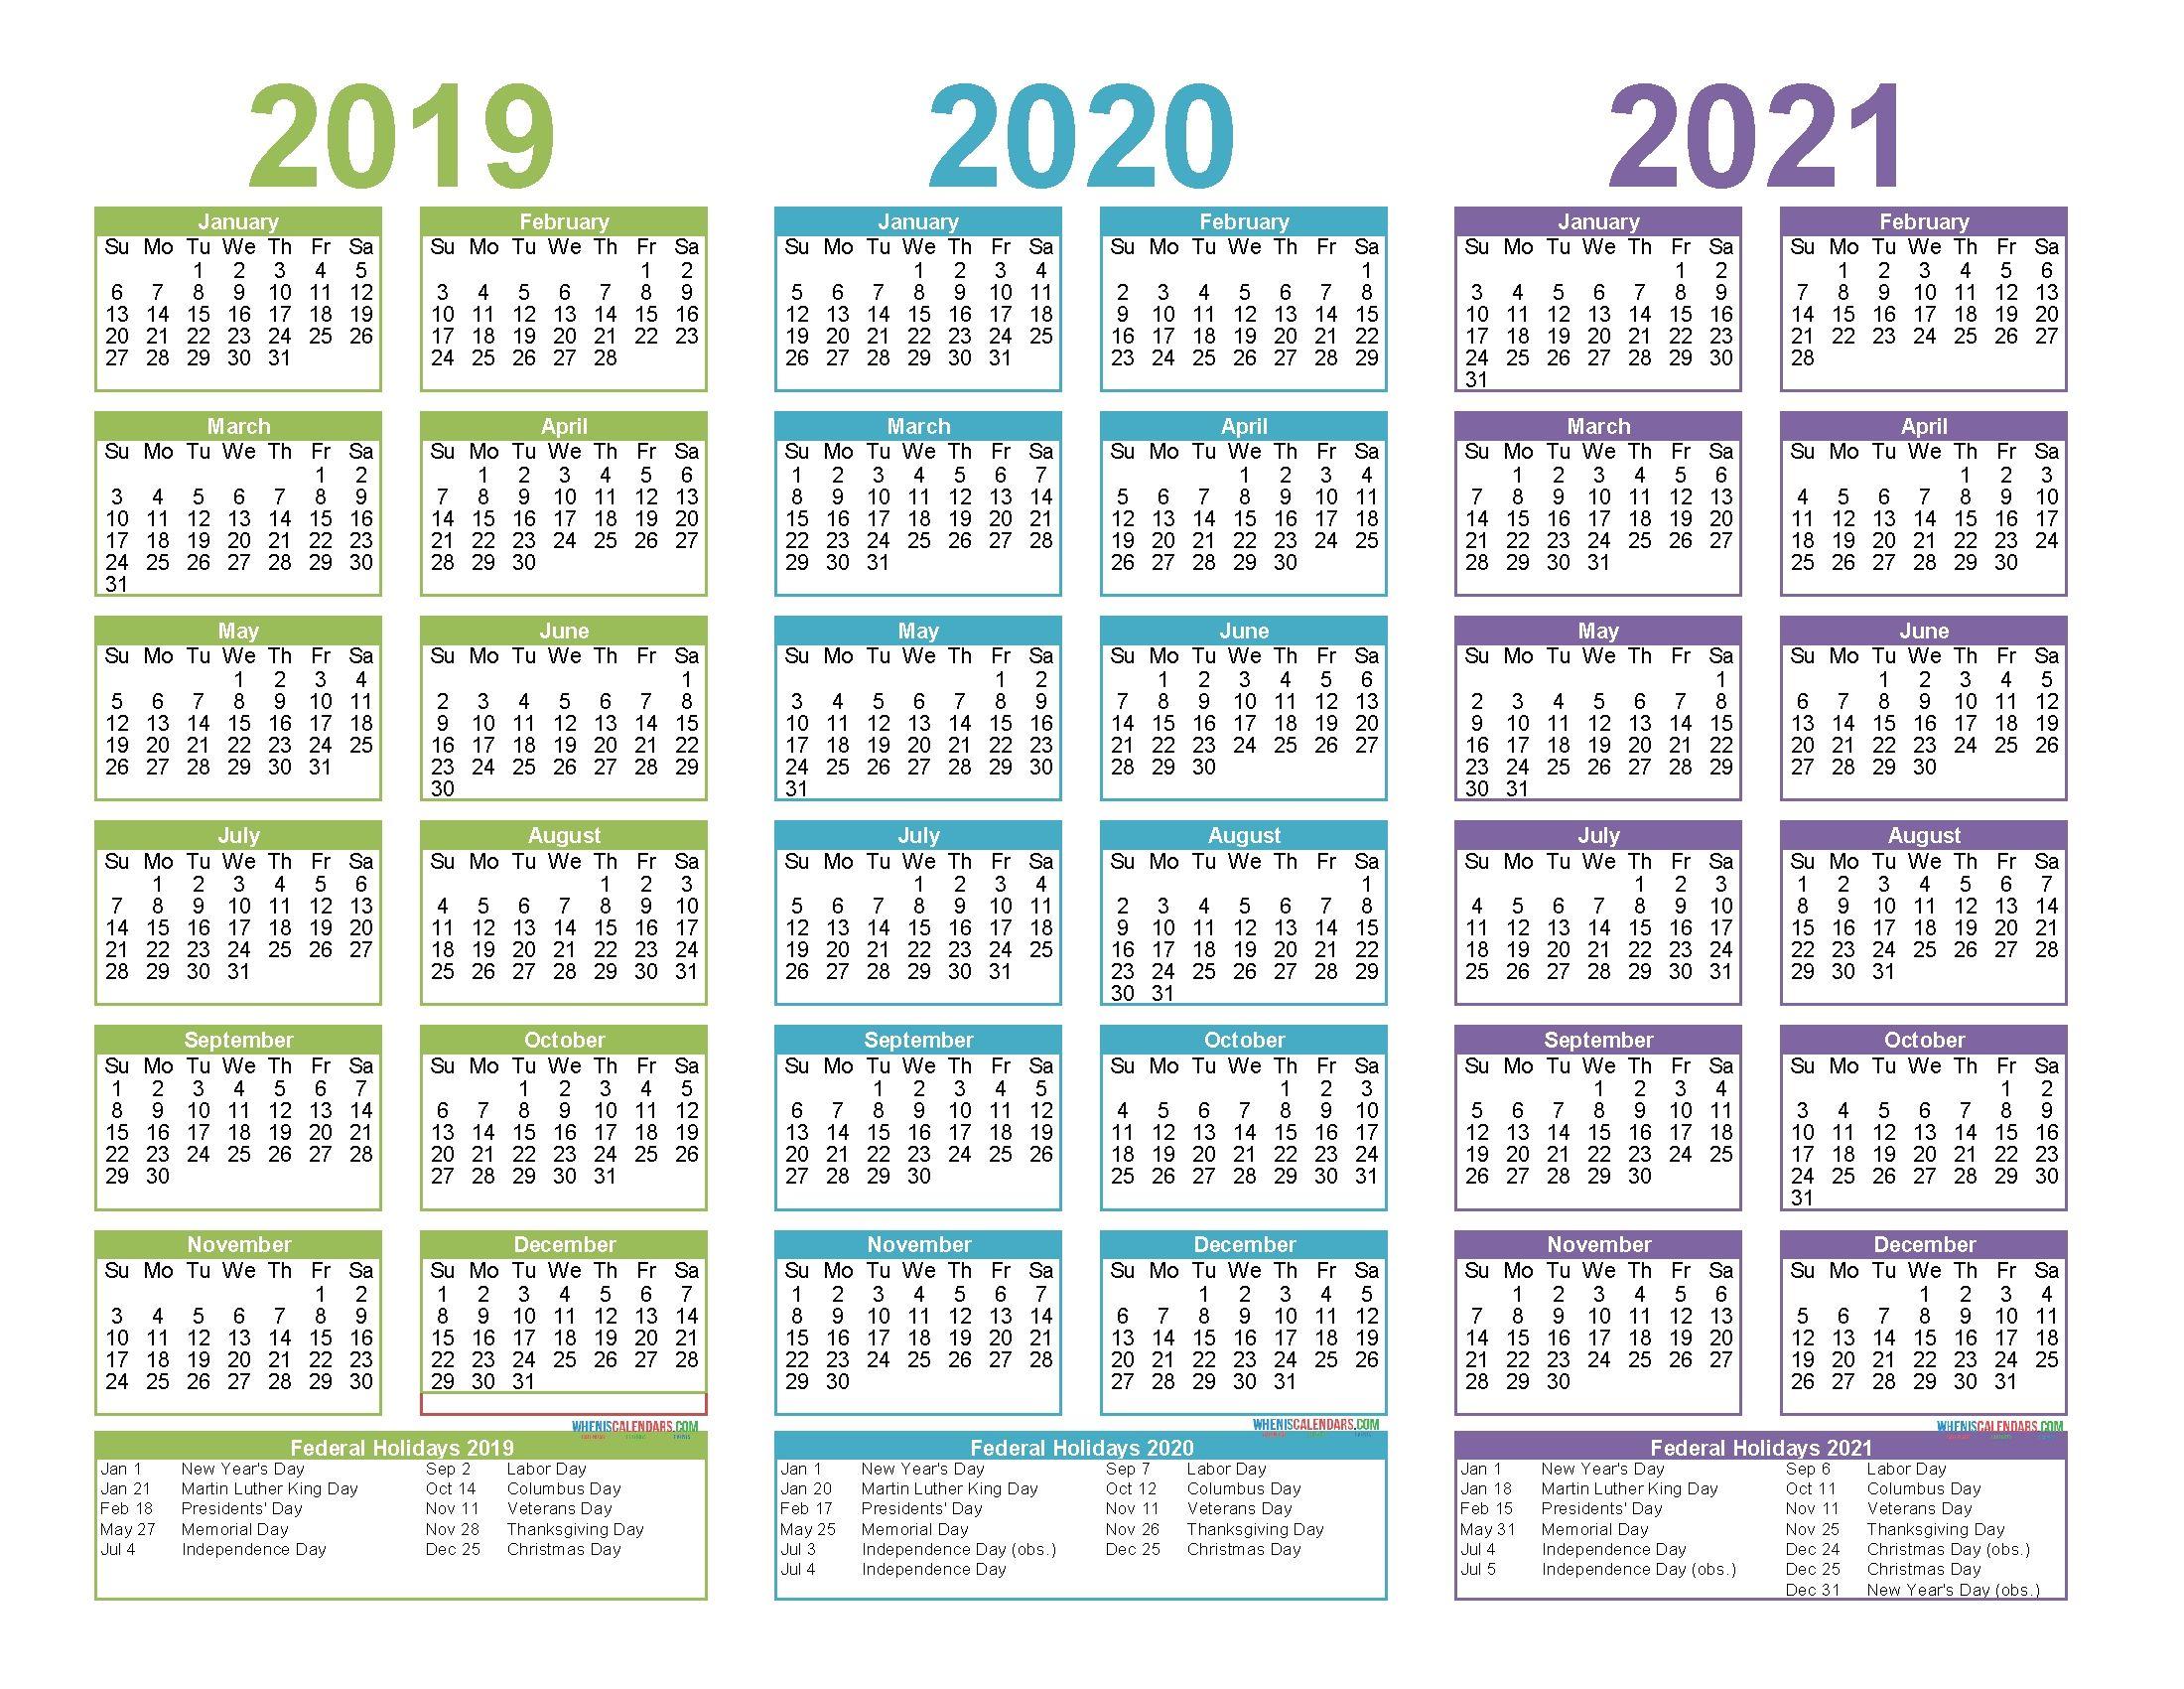 3 Year Calendar Printable 2019 2020 2021 in 2020 ...